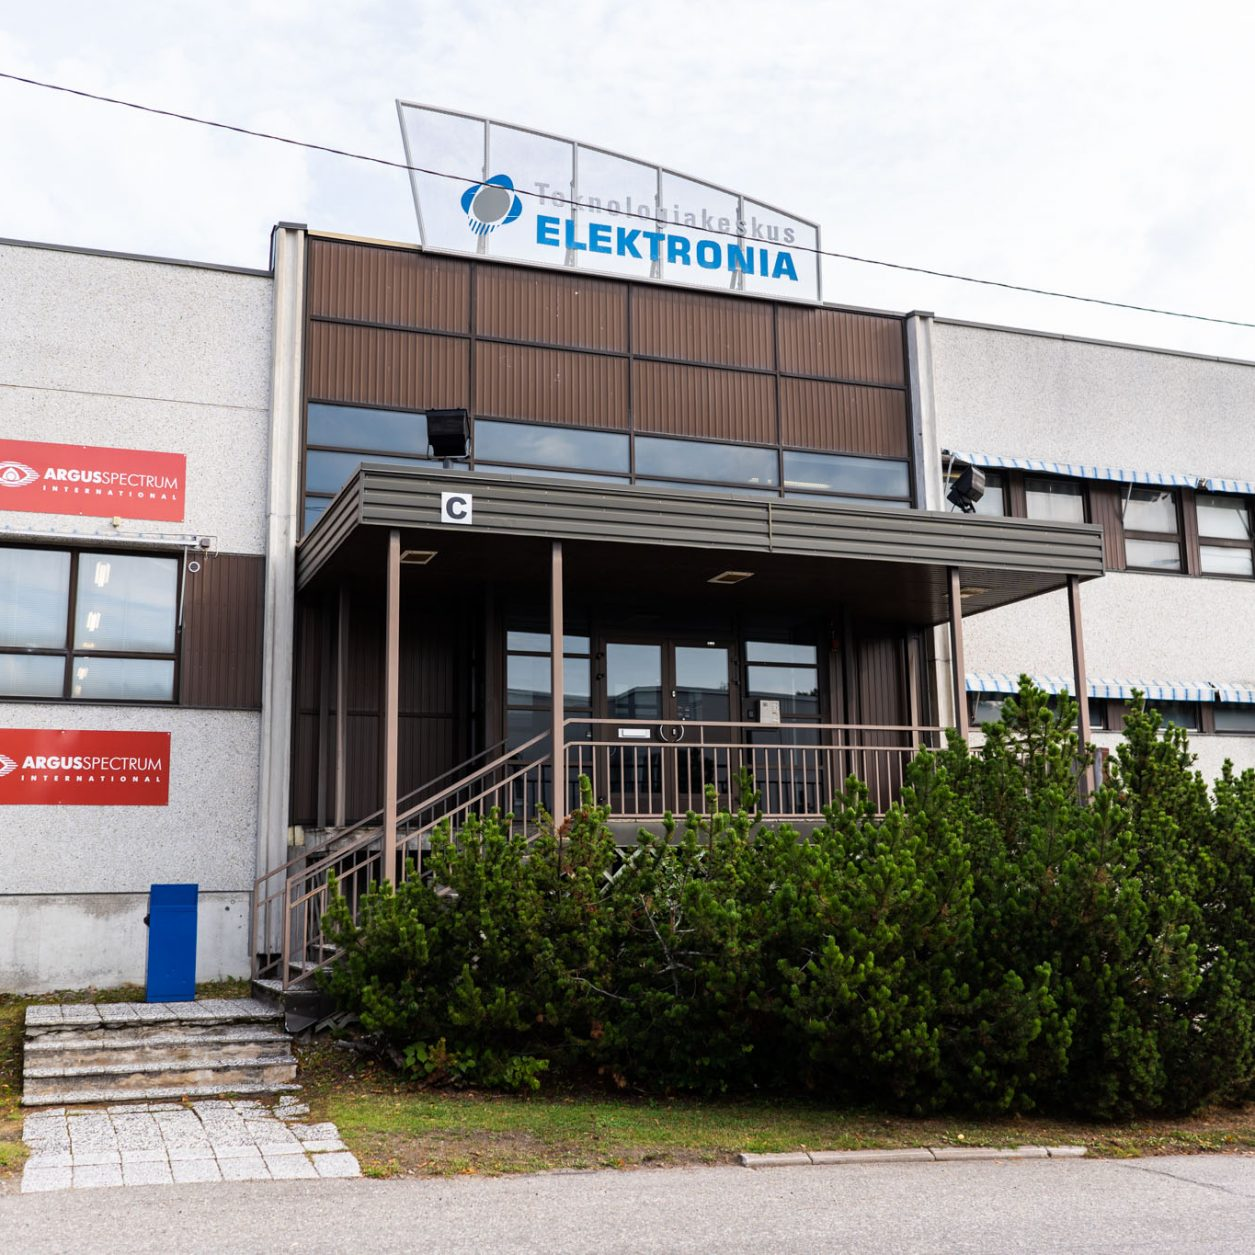 elektronia-savonlinnan-teknologiakeskus-1